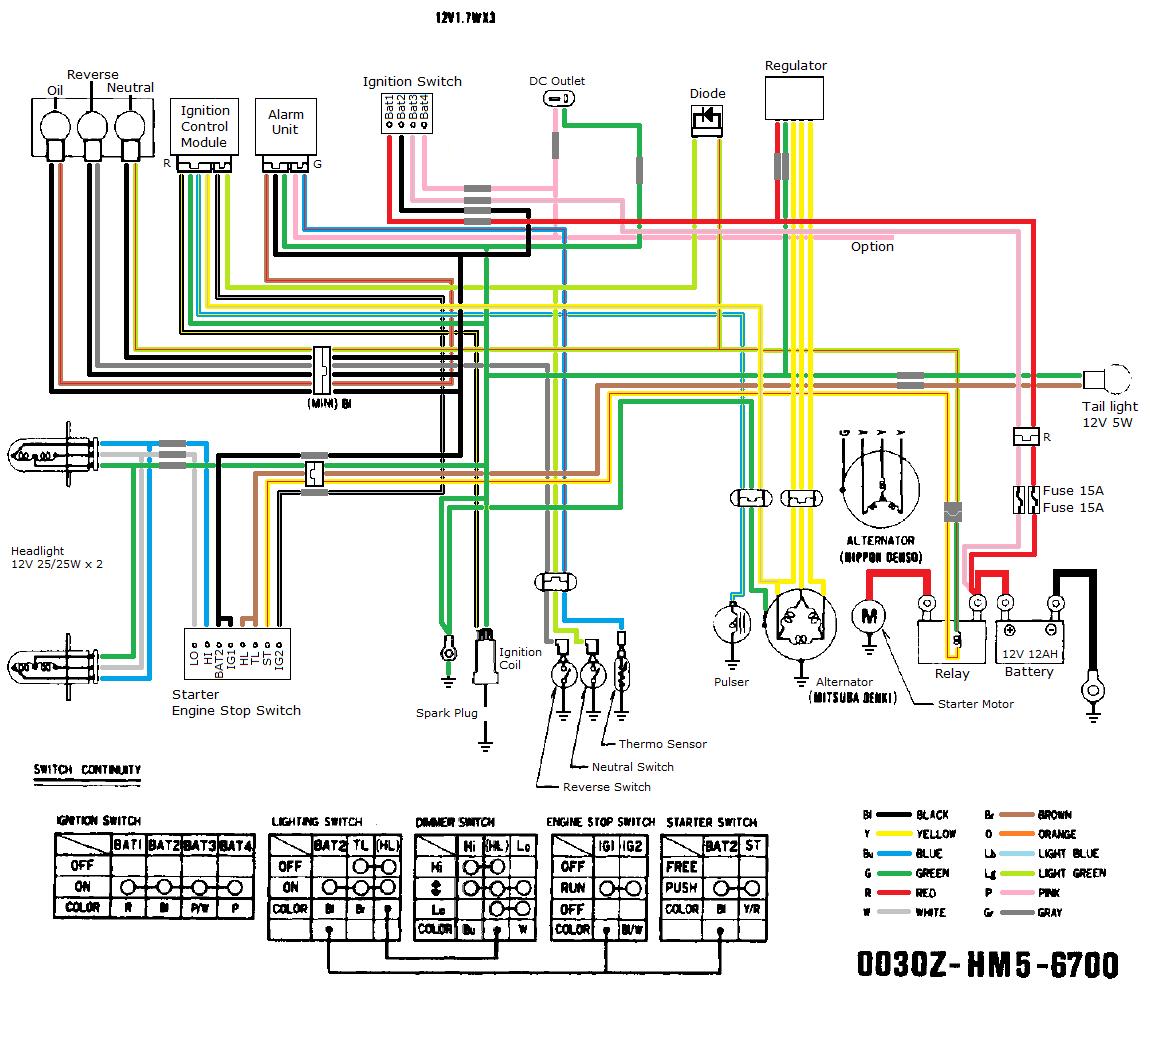 Diagram 2000 Yamaha Yfm90 Wiring Diagram Full Version Hd Quality Wiring Diagram Diagramcindyv Stokker It